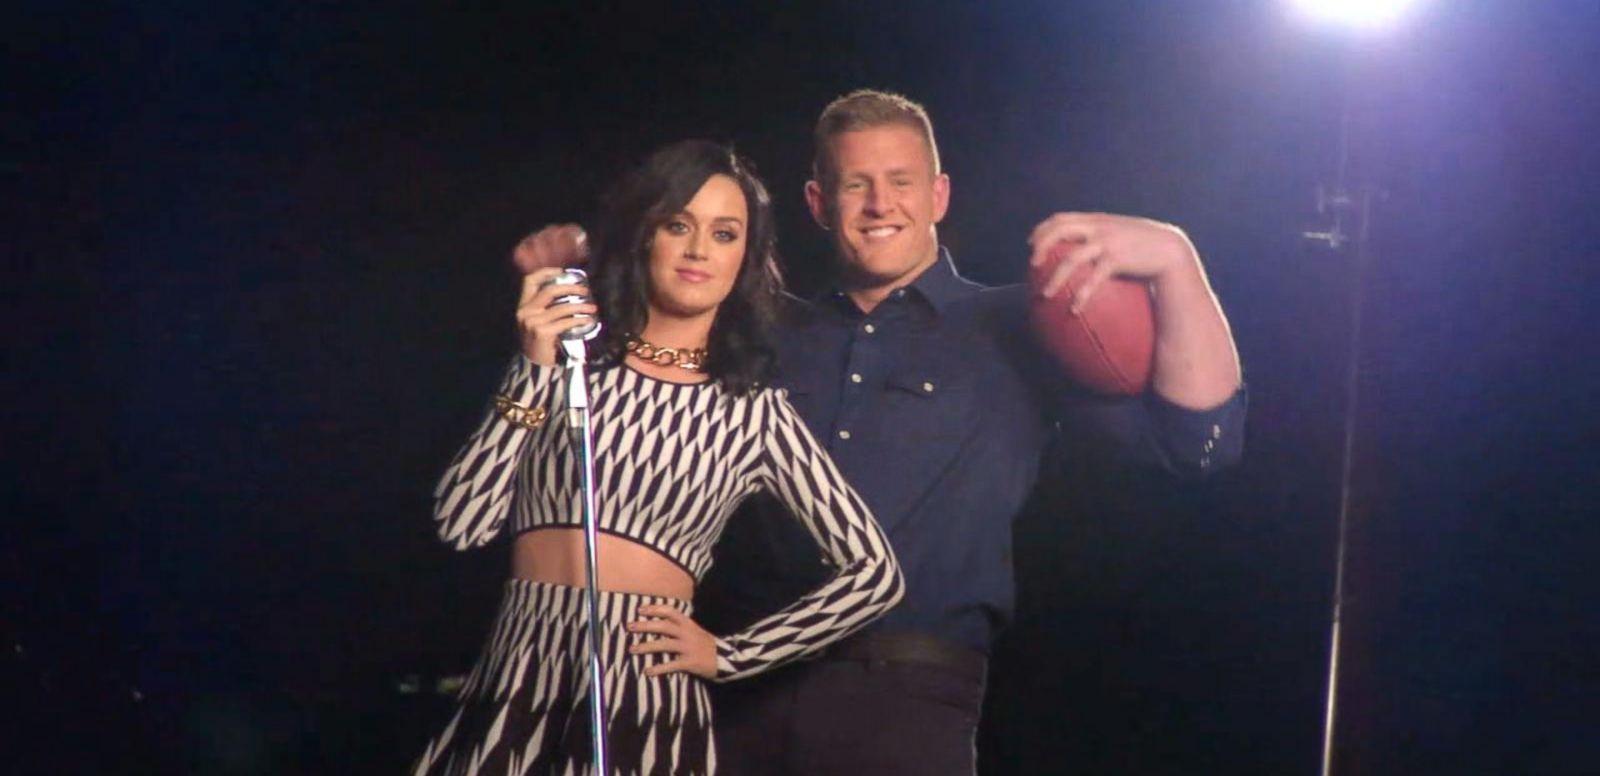 VIDEO: Katy Perry Drops Super Bowl Halftime Show Hints